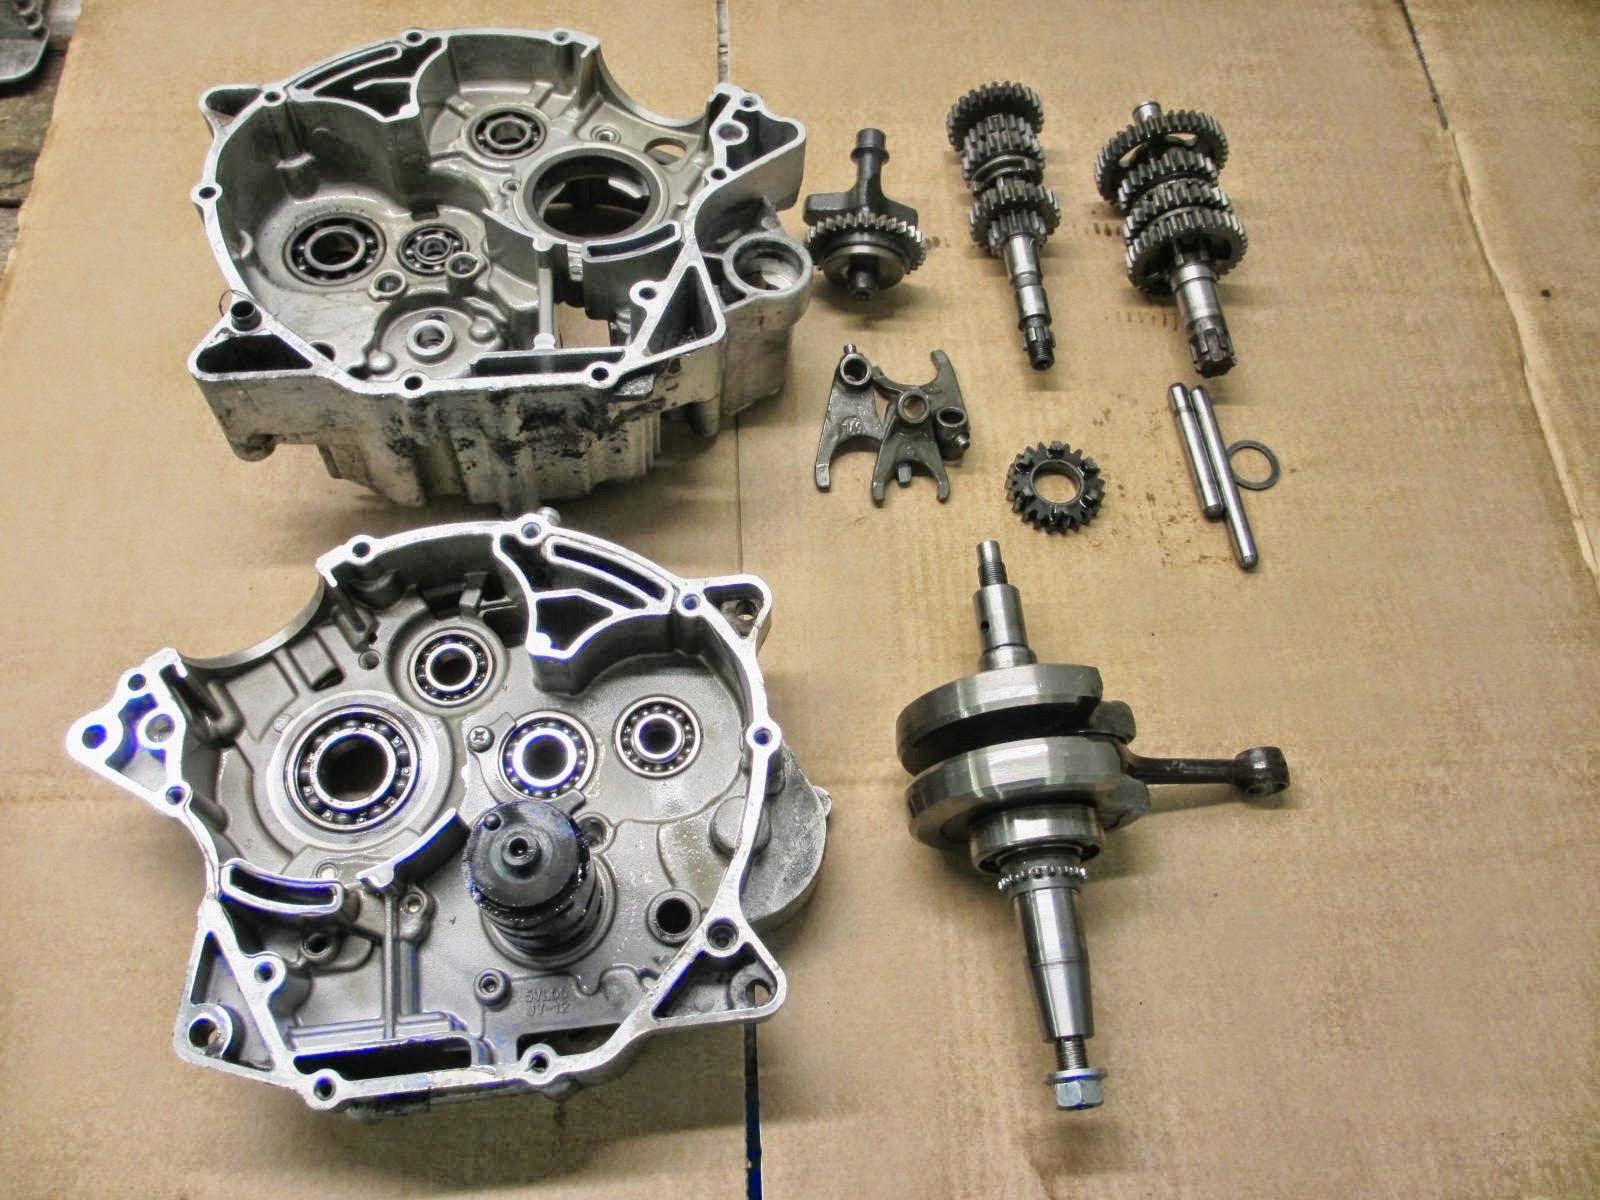 Yamaha YBR 125 Owner Blog : Yamaha YBR 125 gearbox problems , wont